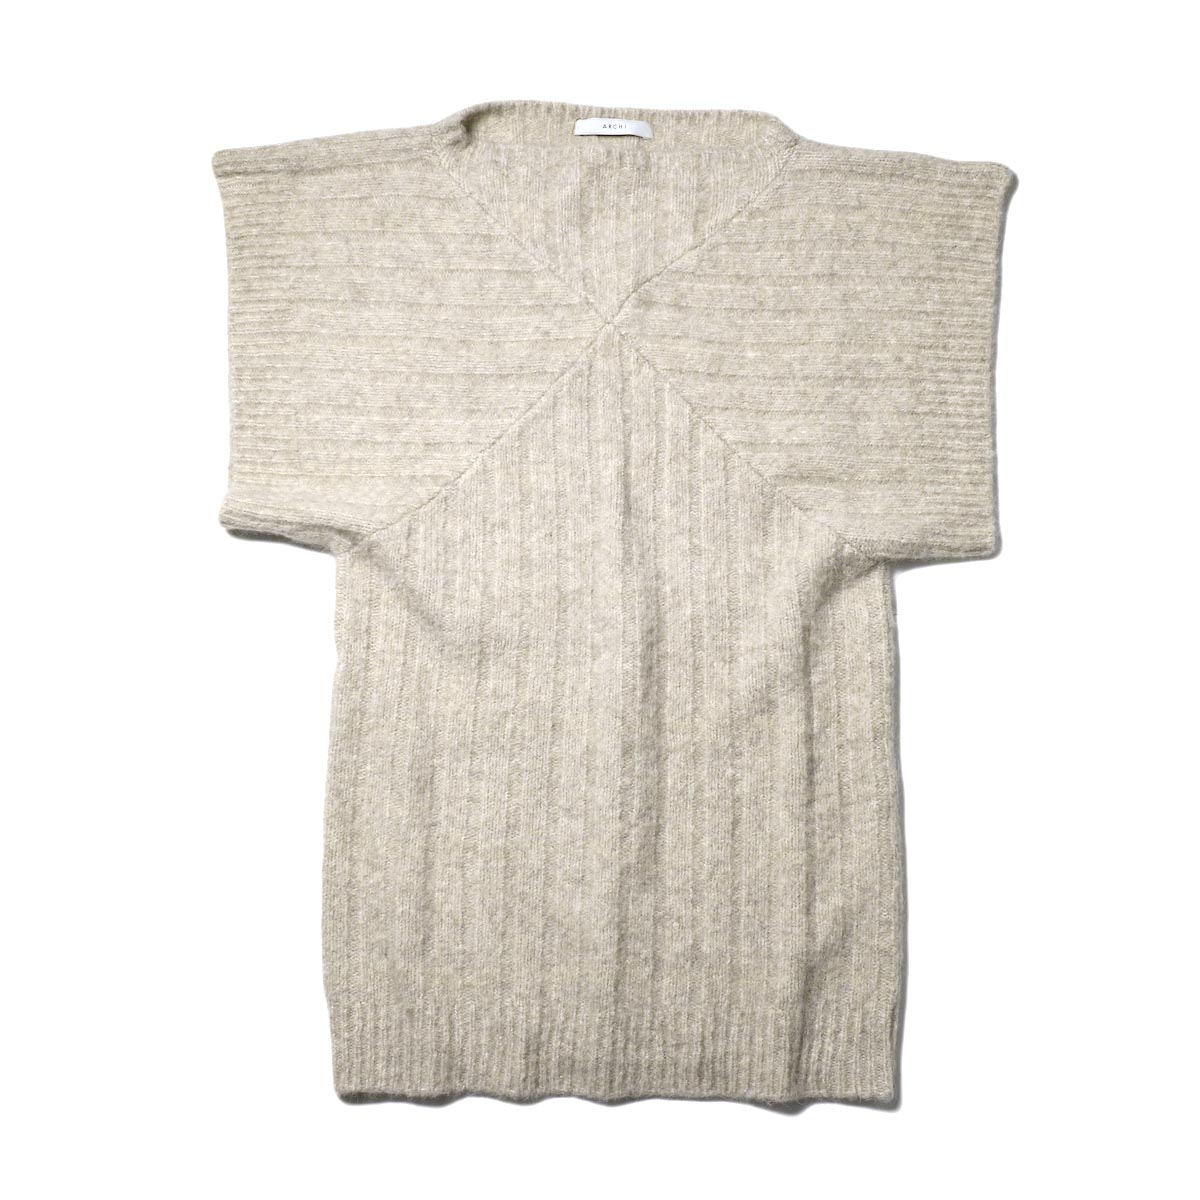 ARCHI / Harmsii Knit Tunic Top (white)